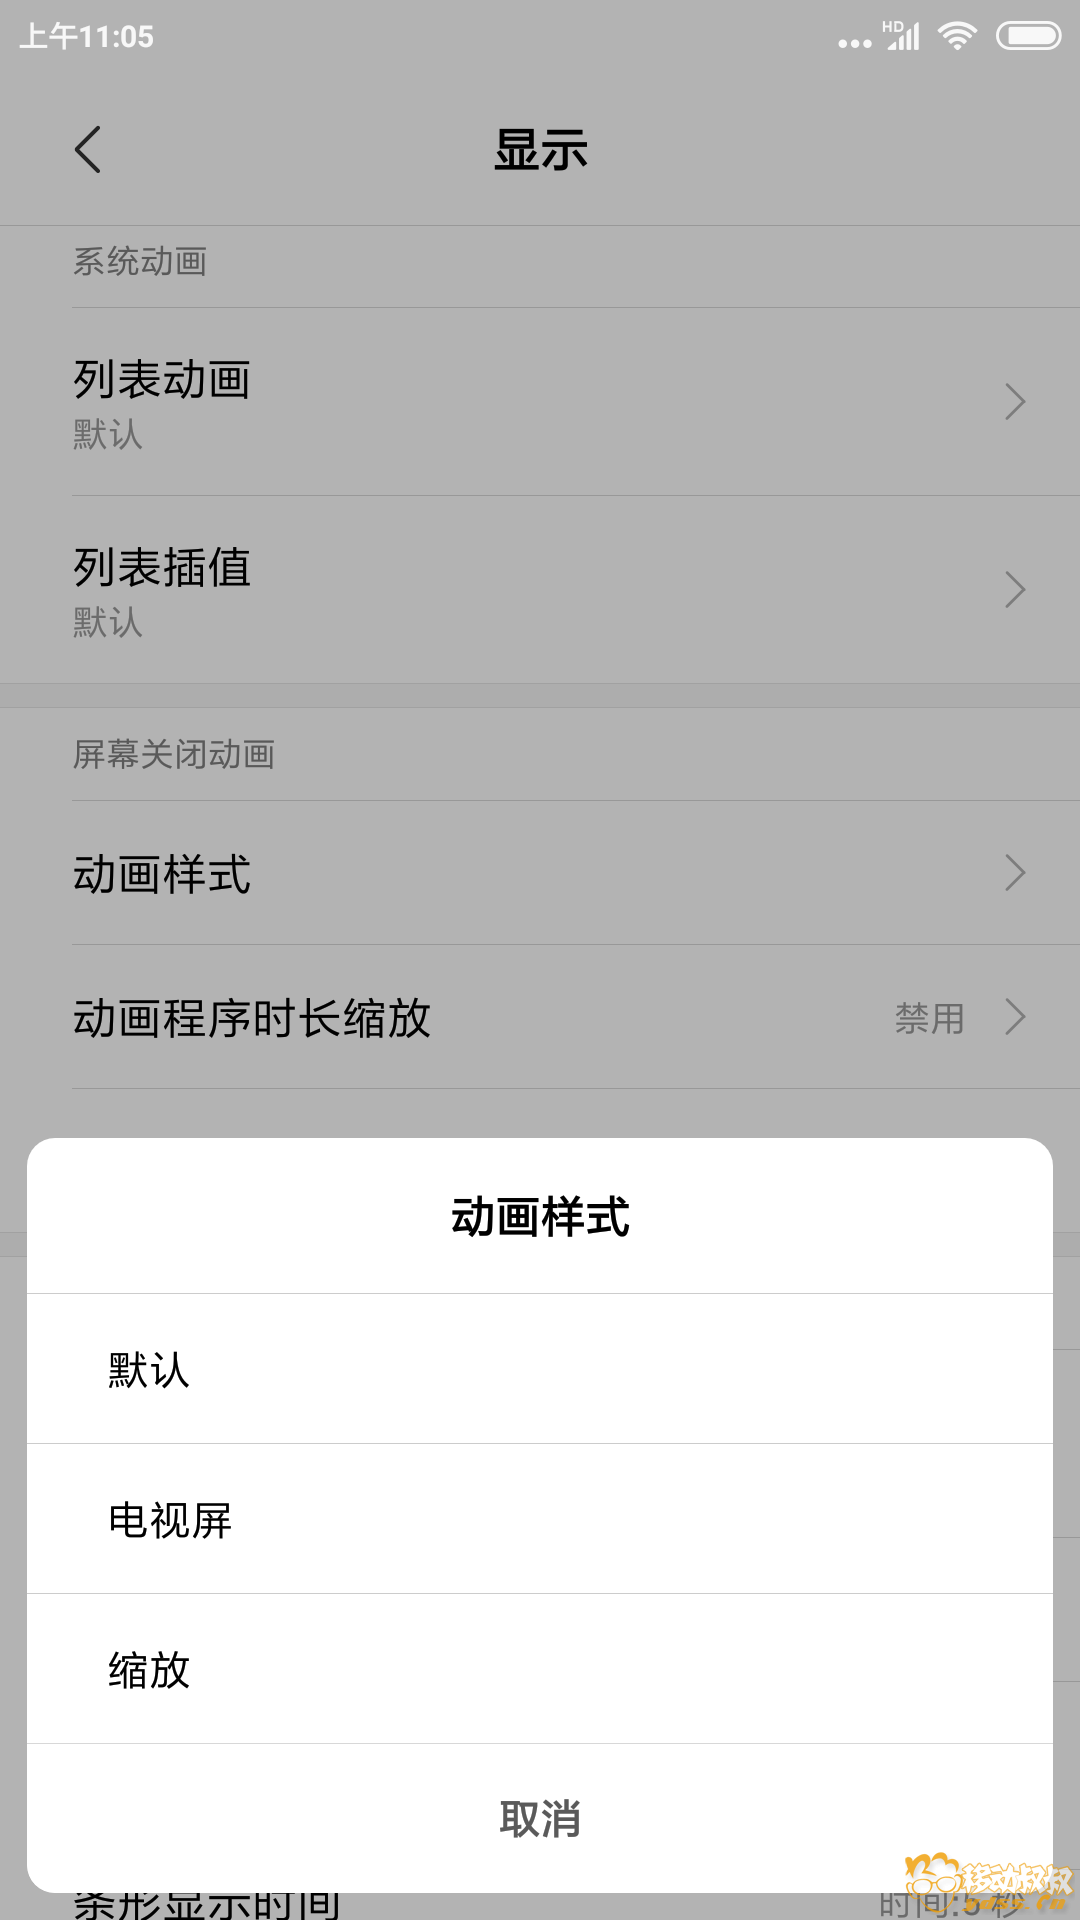 Screenshot_2018-07-02-11-05-19-250_com.android.settings.png